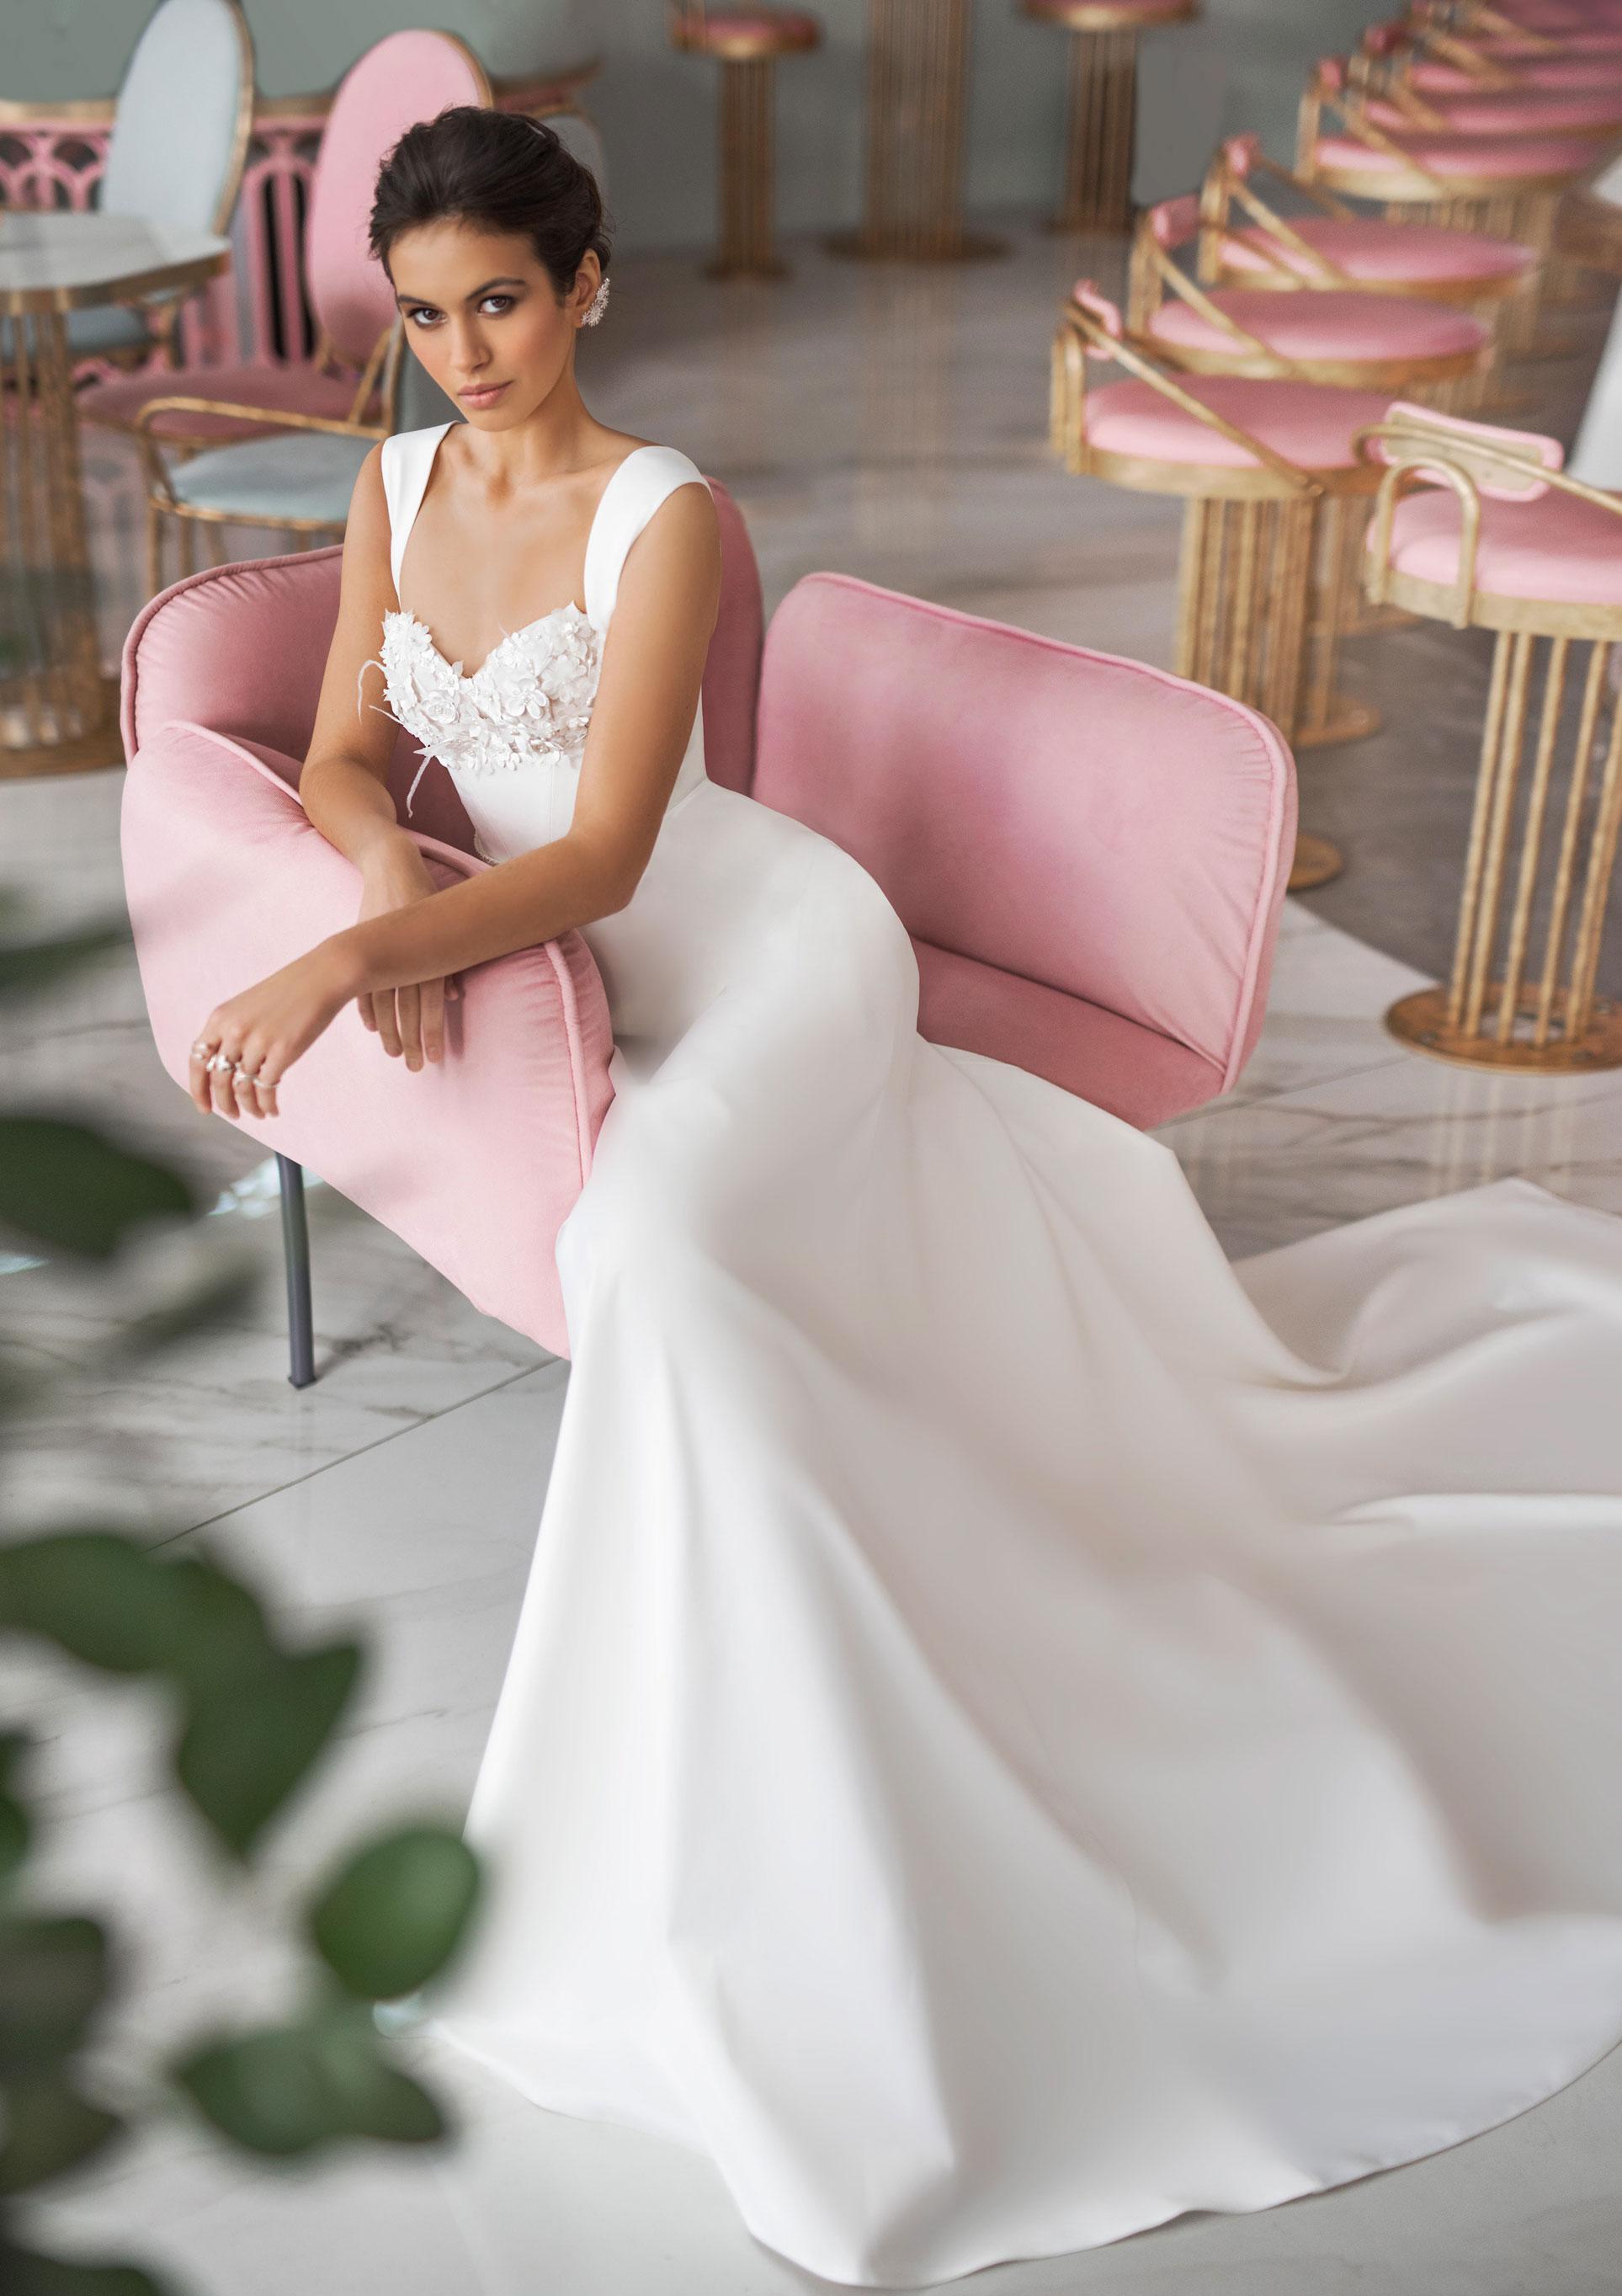 Ксения Саладуха в свадебных нарядах Ave Wedding, весна-лето 2019 / фото 04